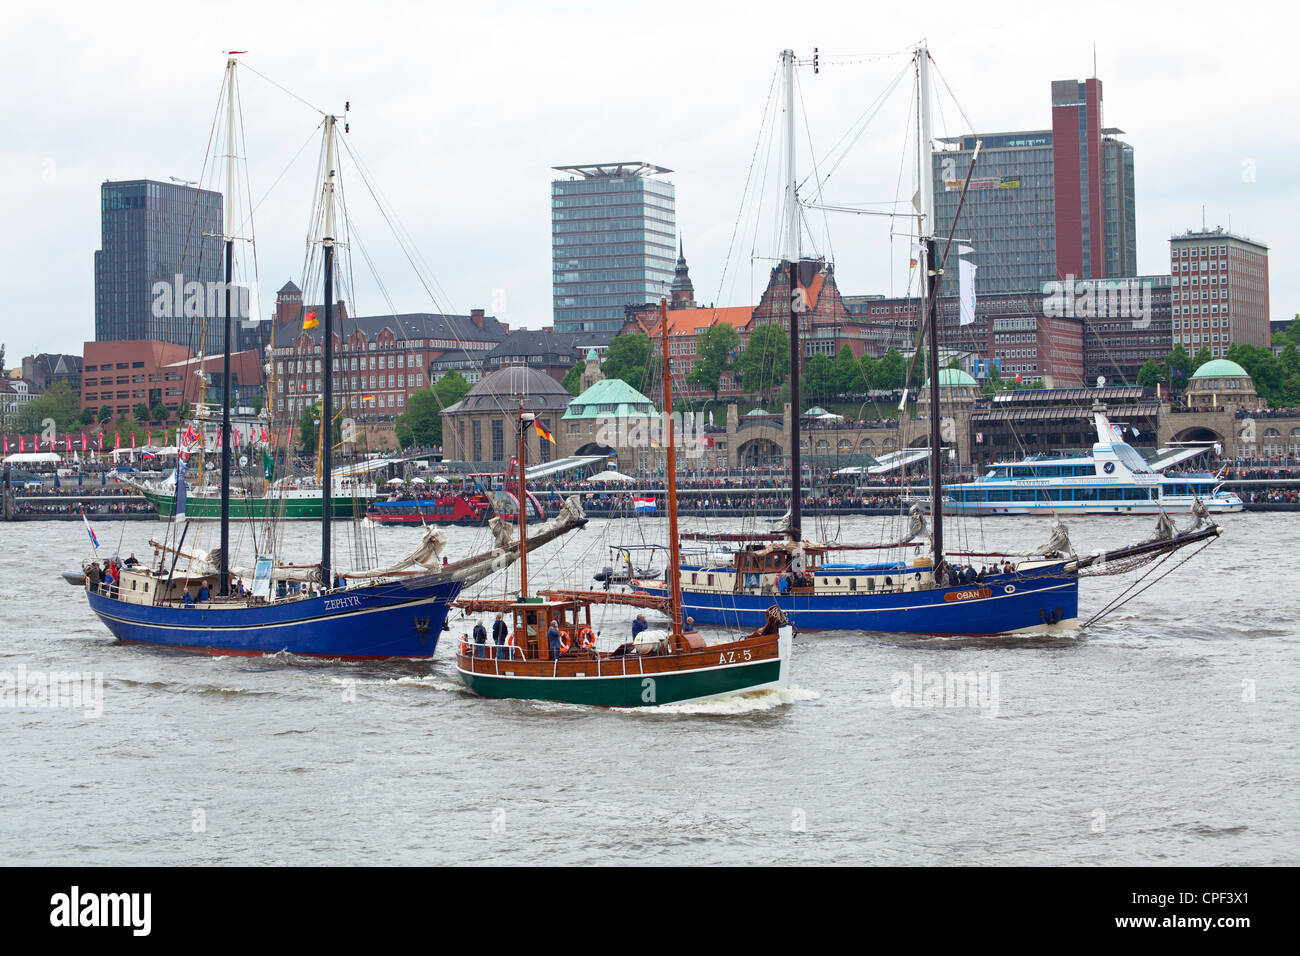 sailing ships Zephyr, AZ:5 and Oban, Harbour Birthday, Hamburg, Germany - Stock Image